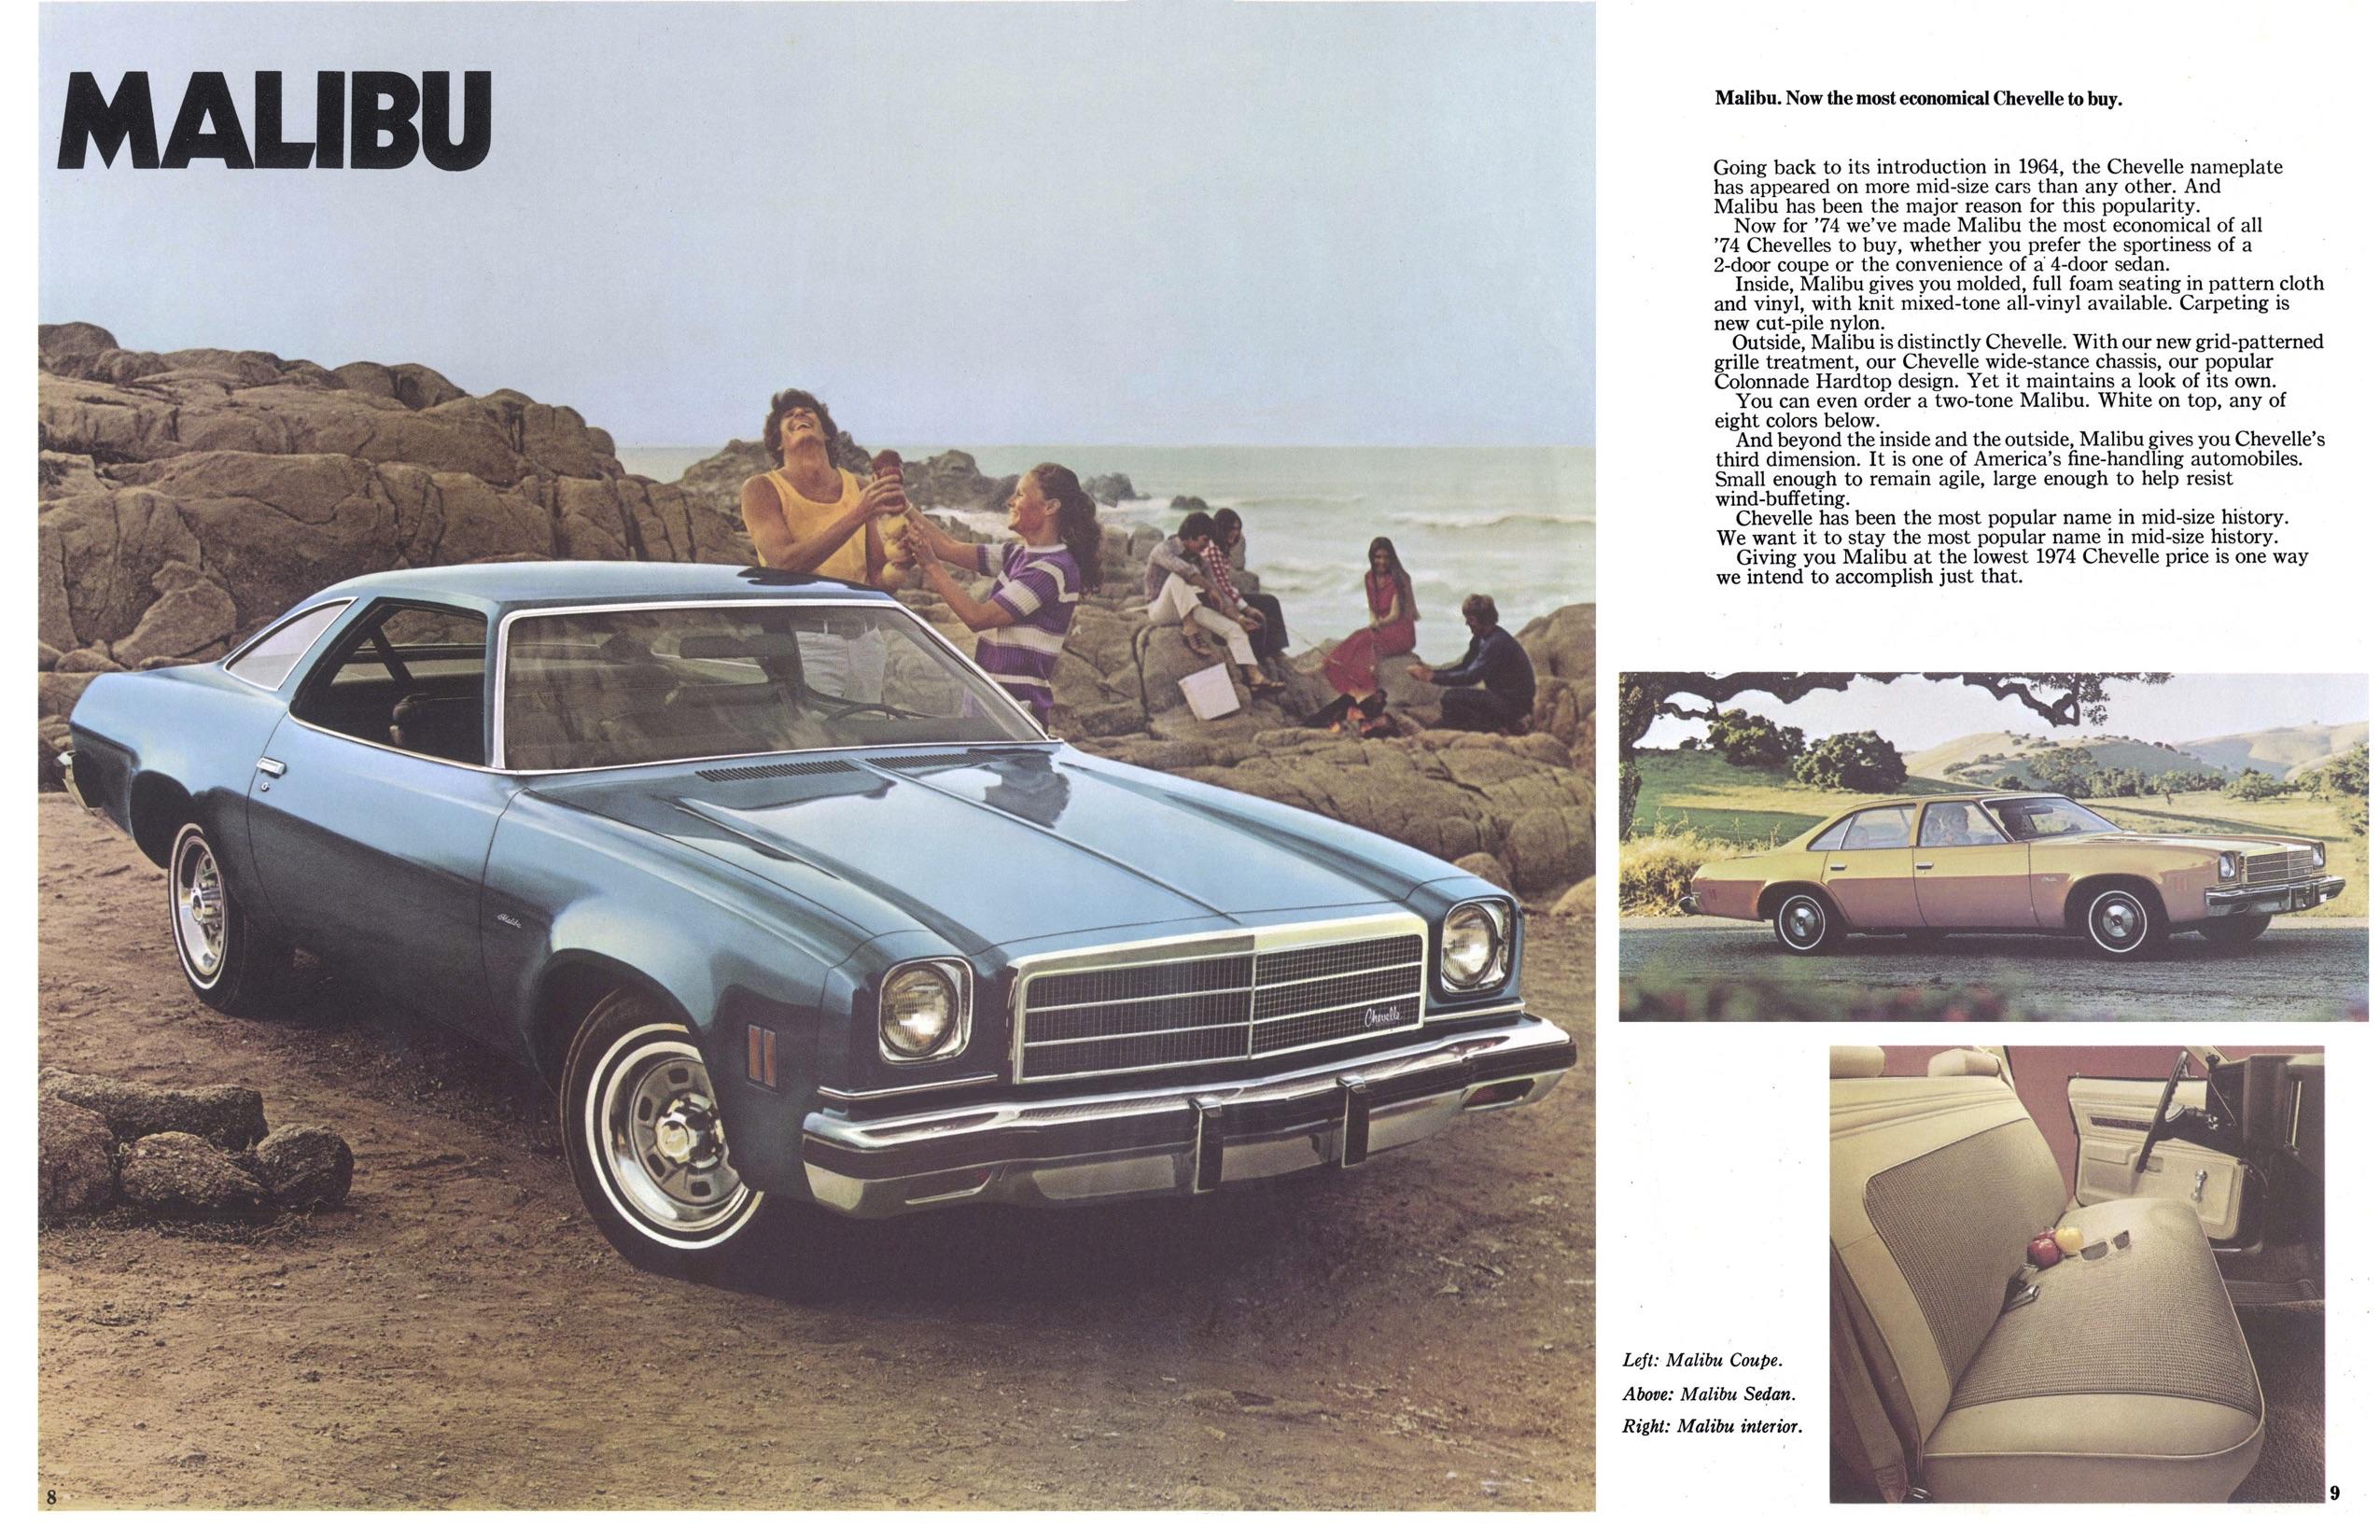 1974 Chevelle Malibu Parts And Restoration Information